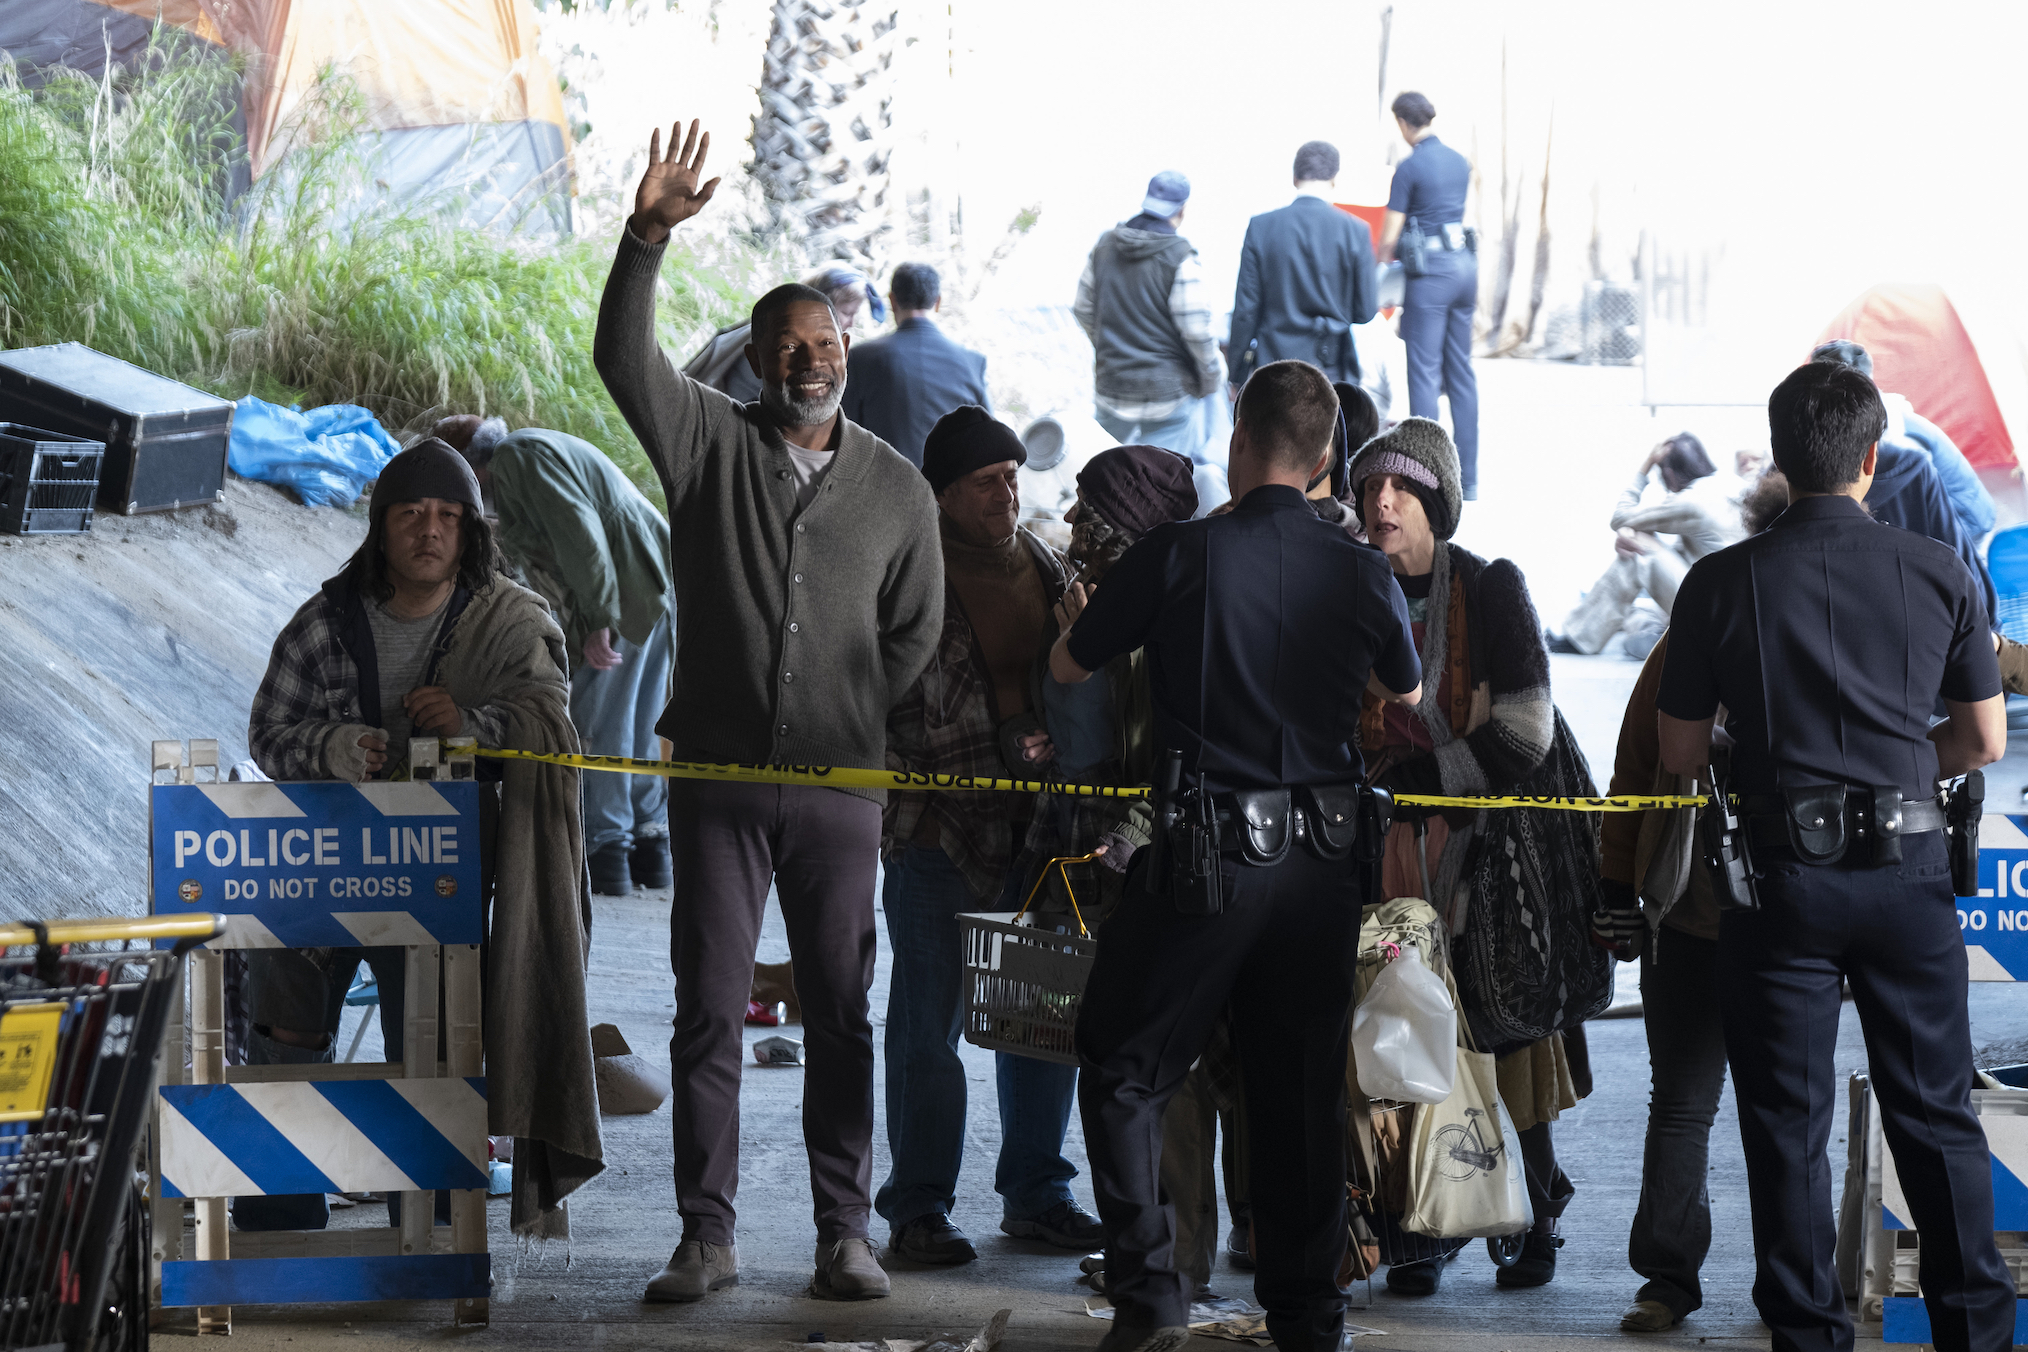 Dennis Haysbert God Lucifer saison 5 épisode 11